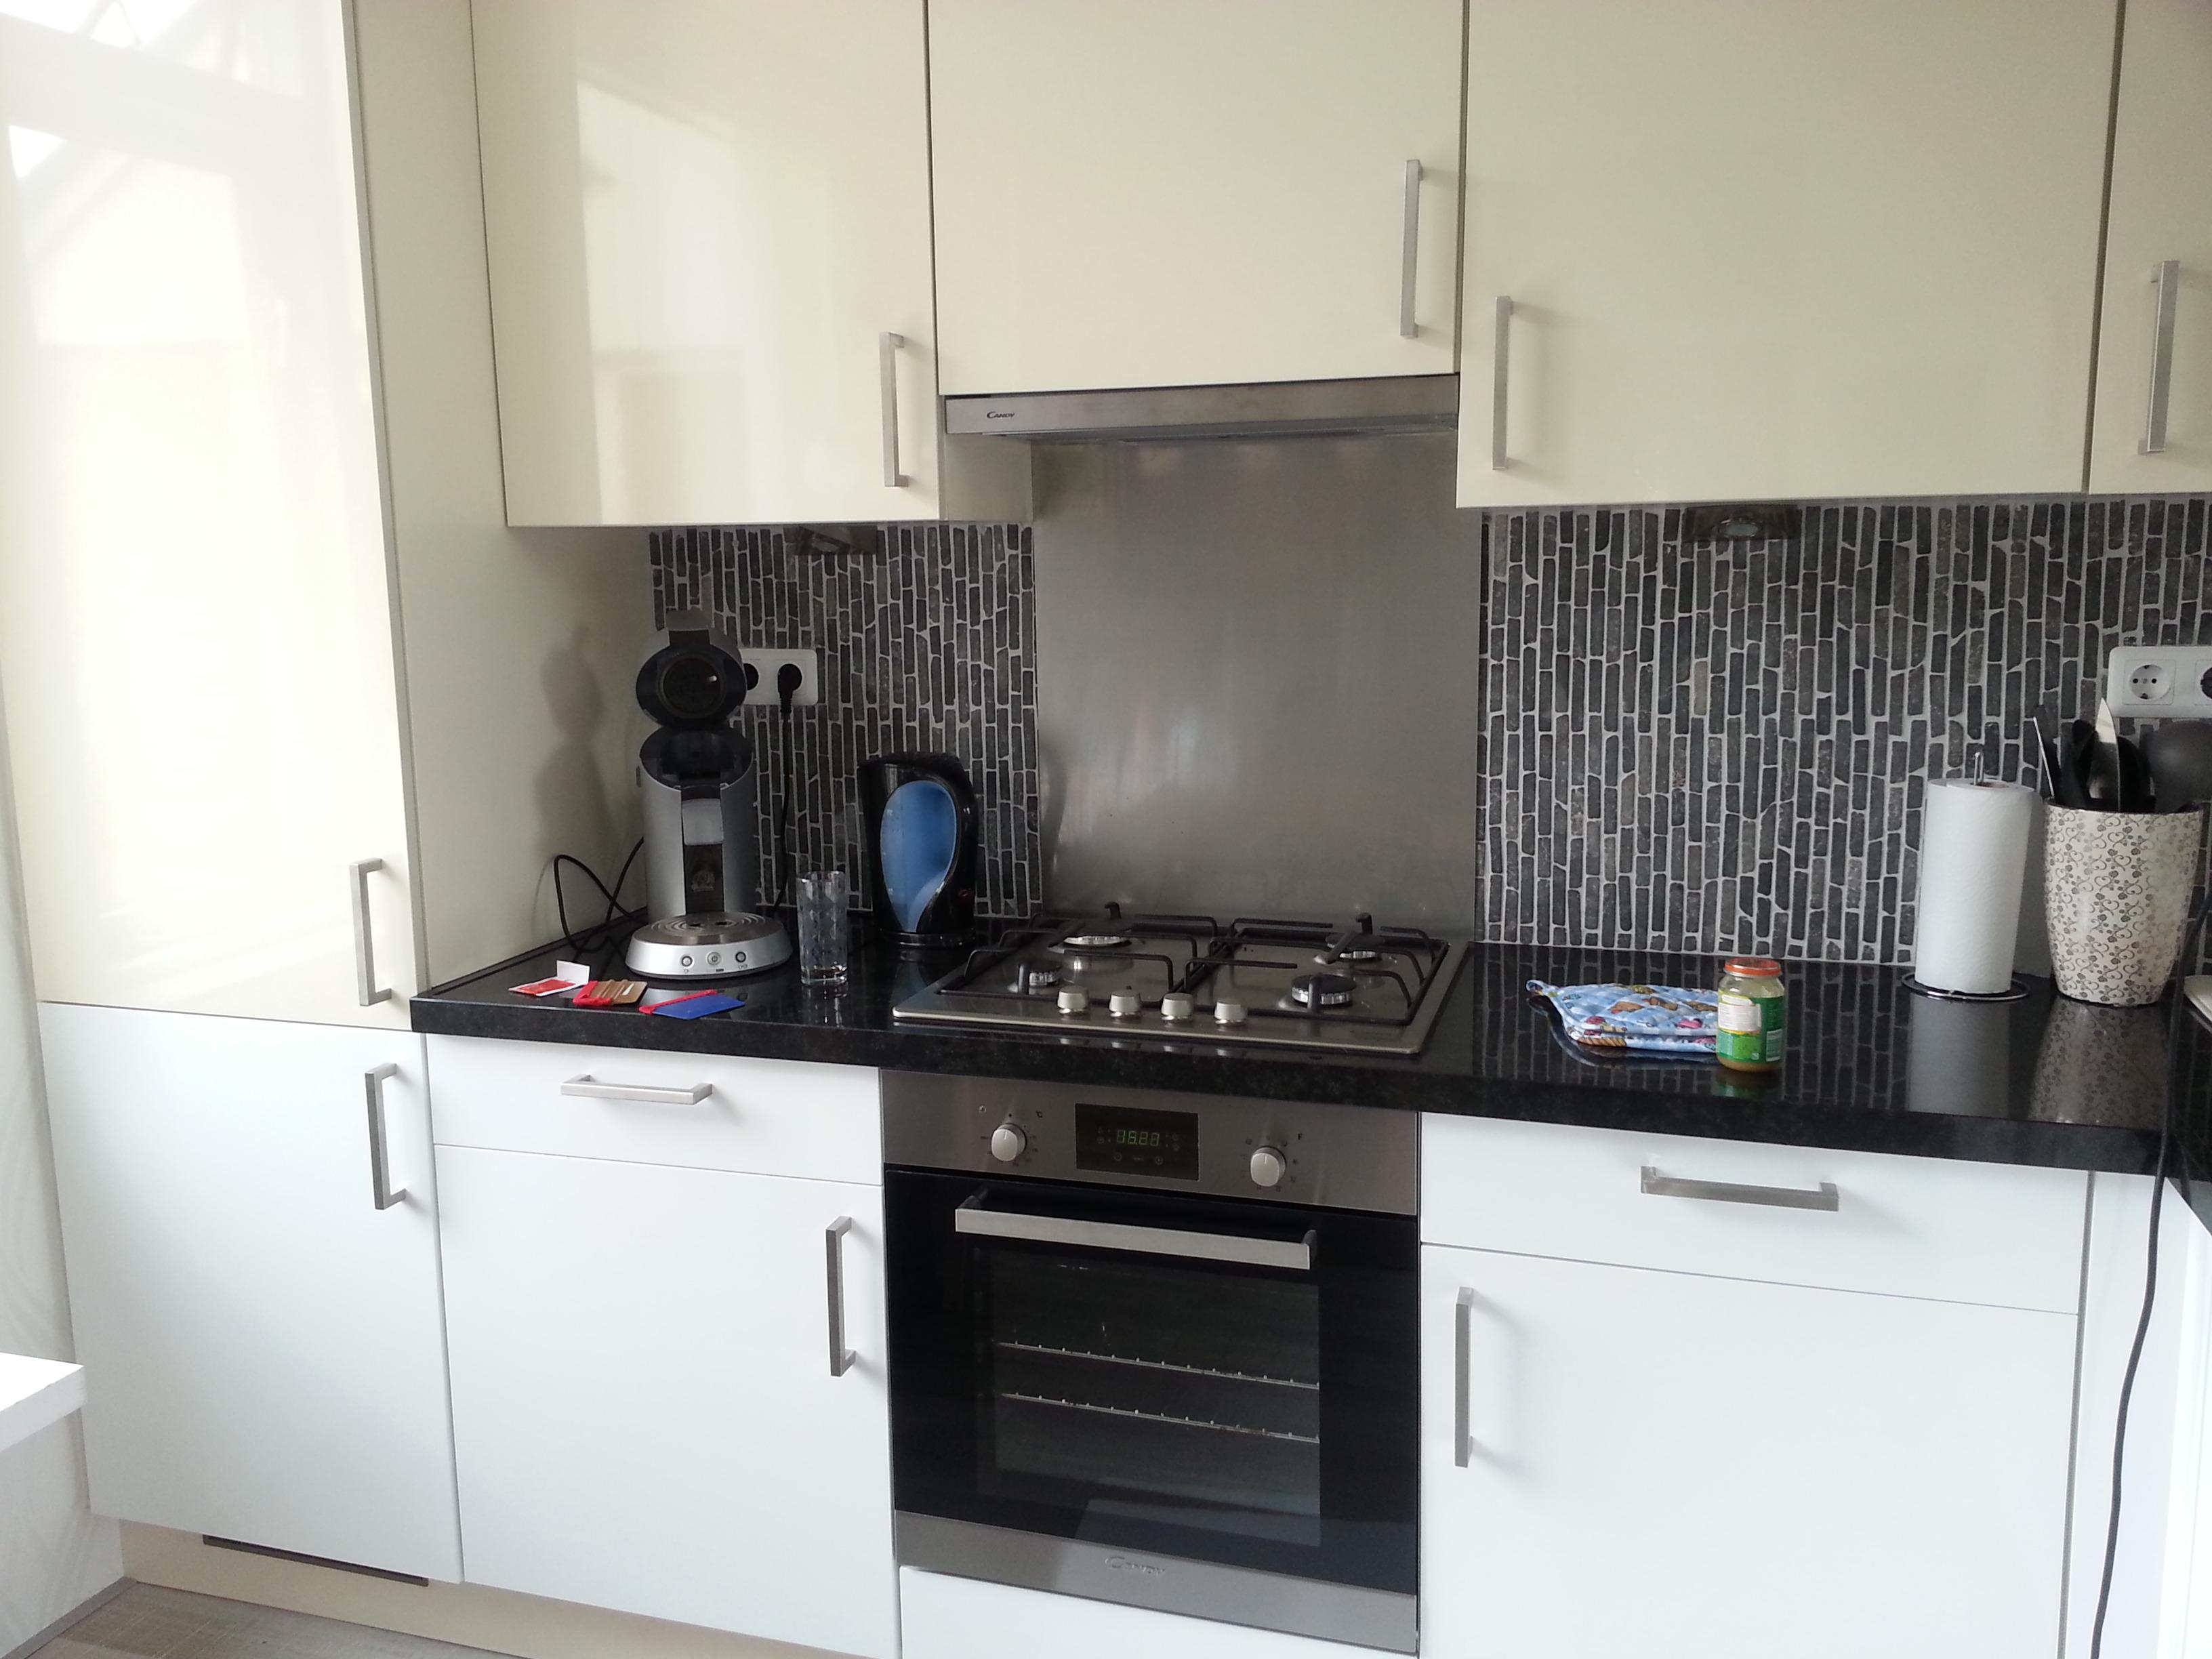 Hoogglans Witte Keuken : Keuken u magnolia geel naar hoogglans wit